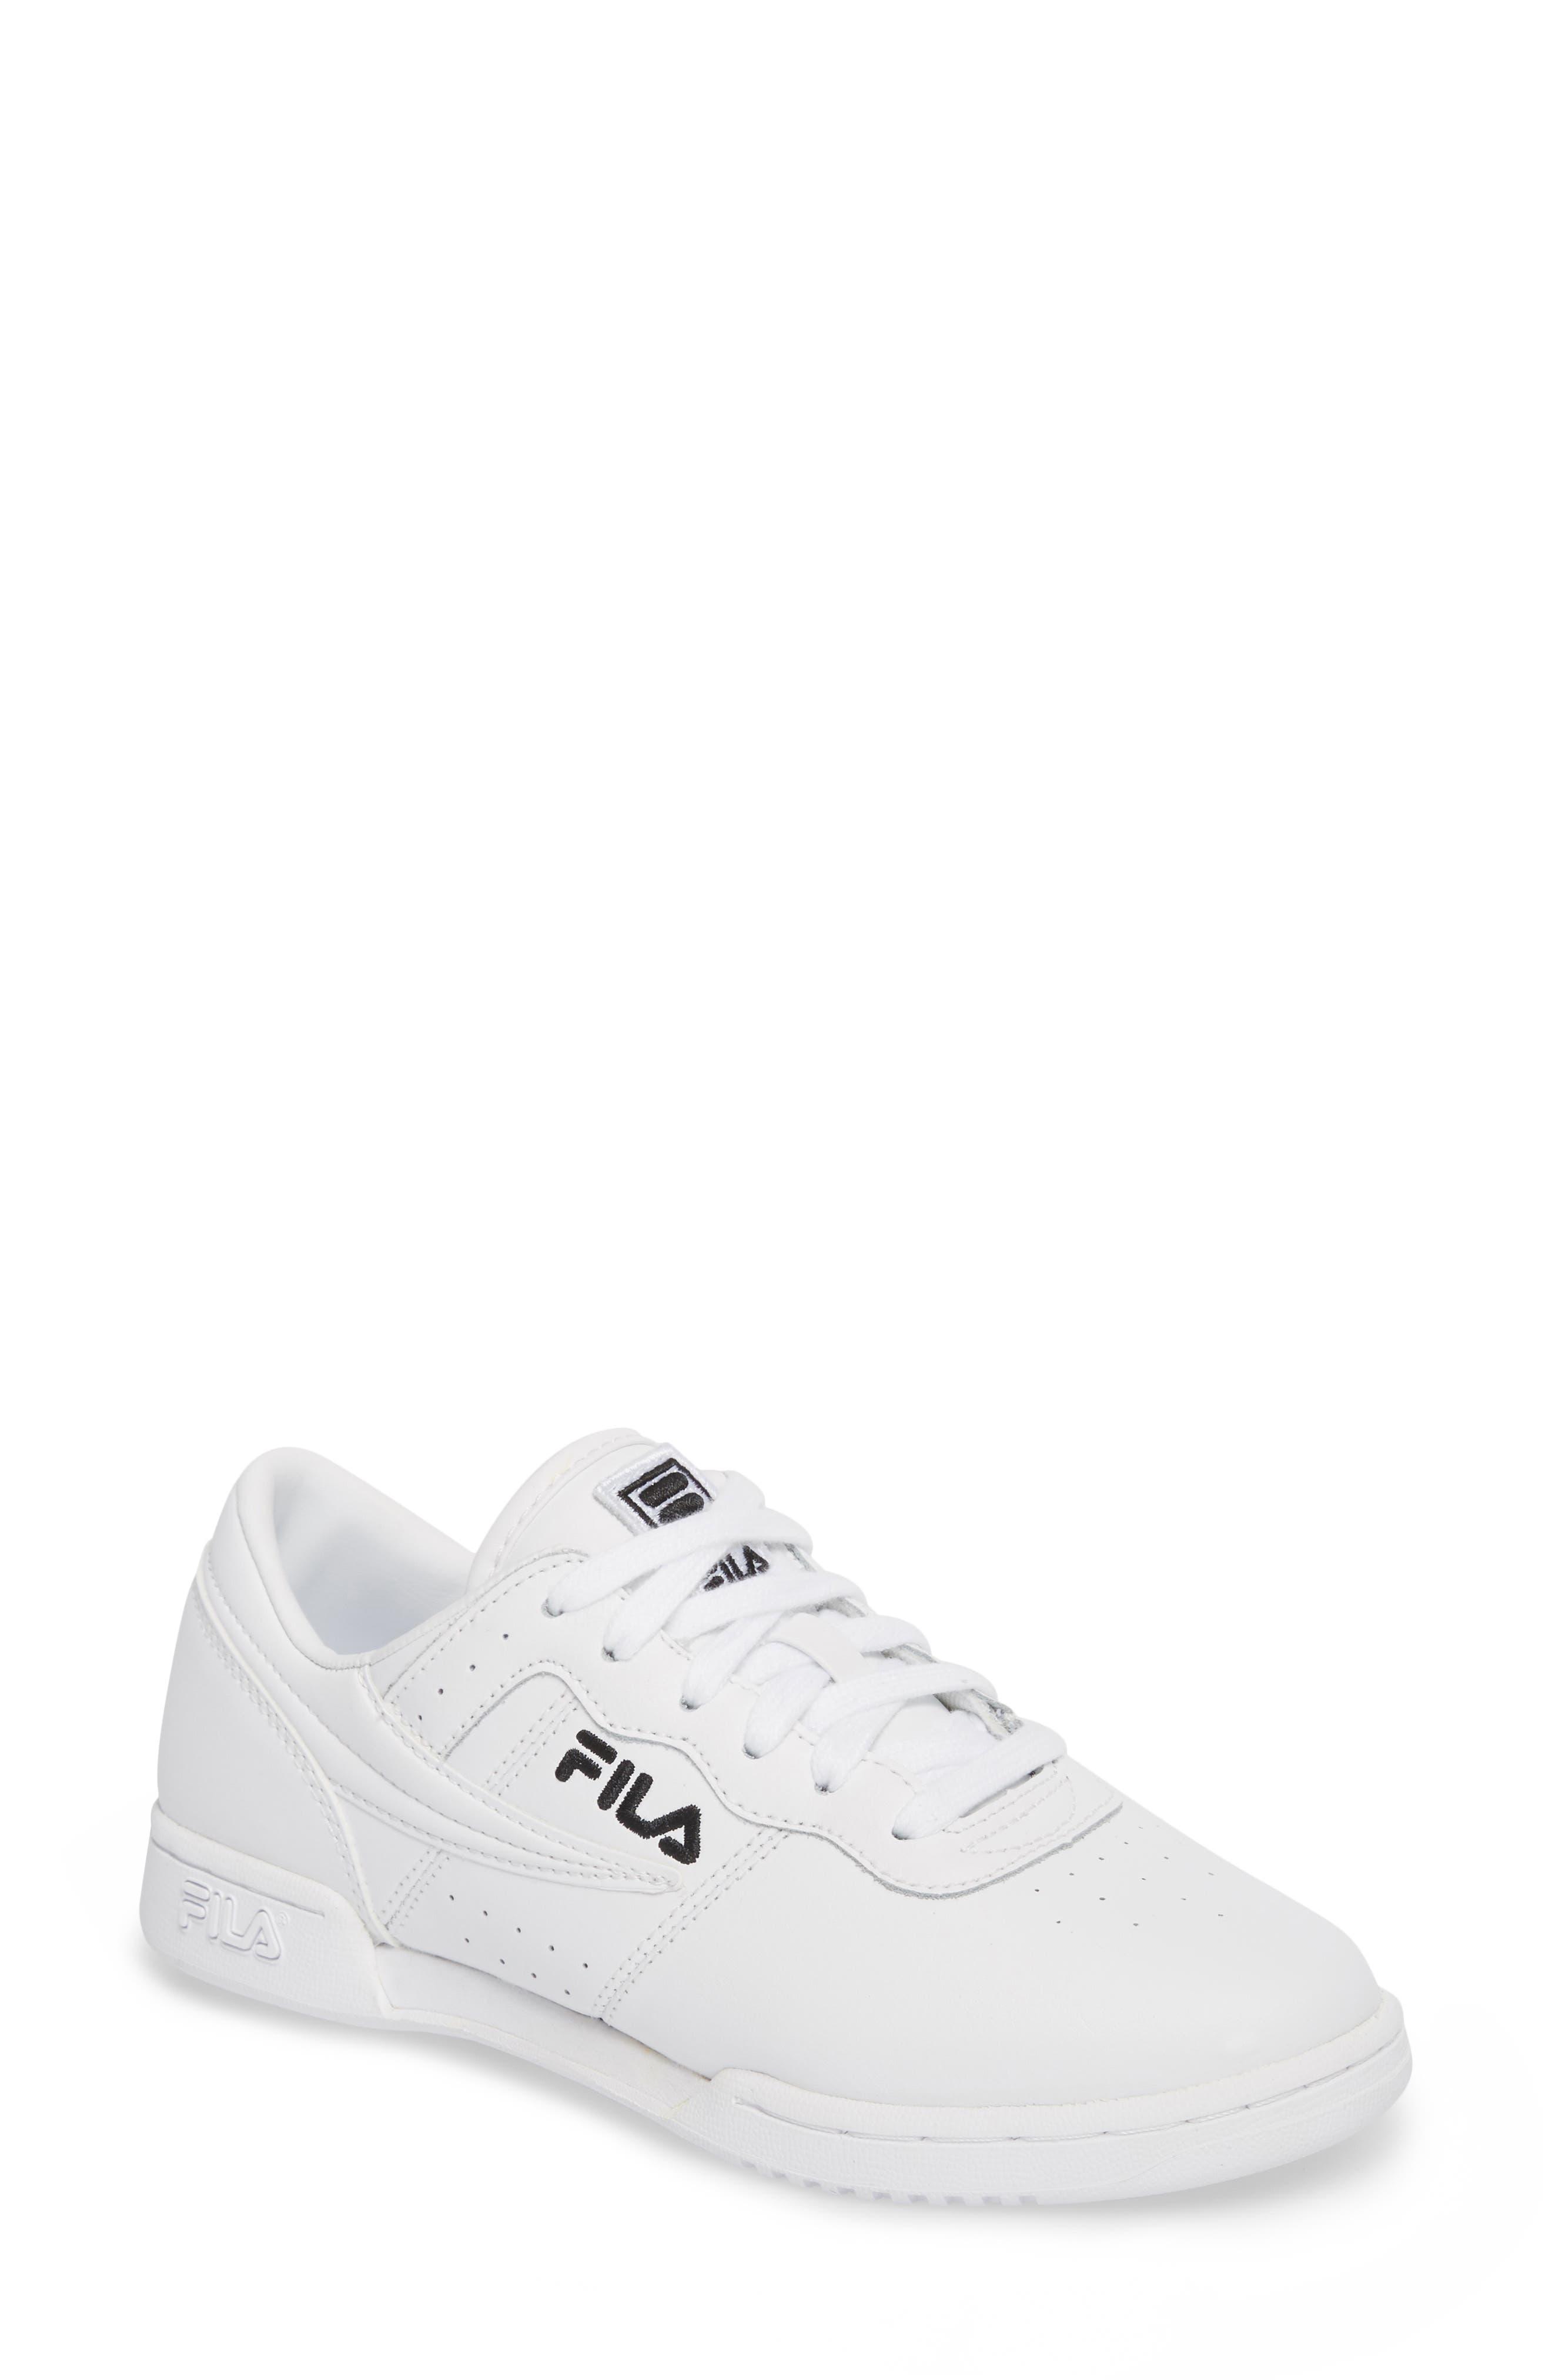 fila shoes 49953 cane